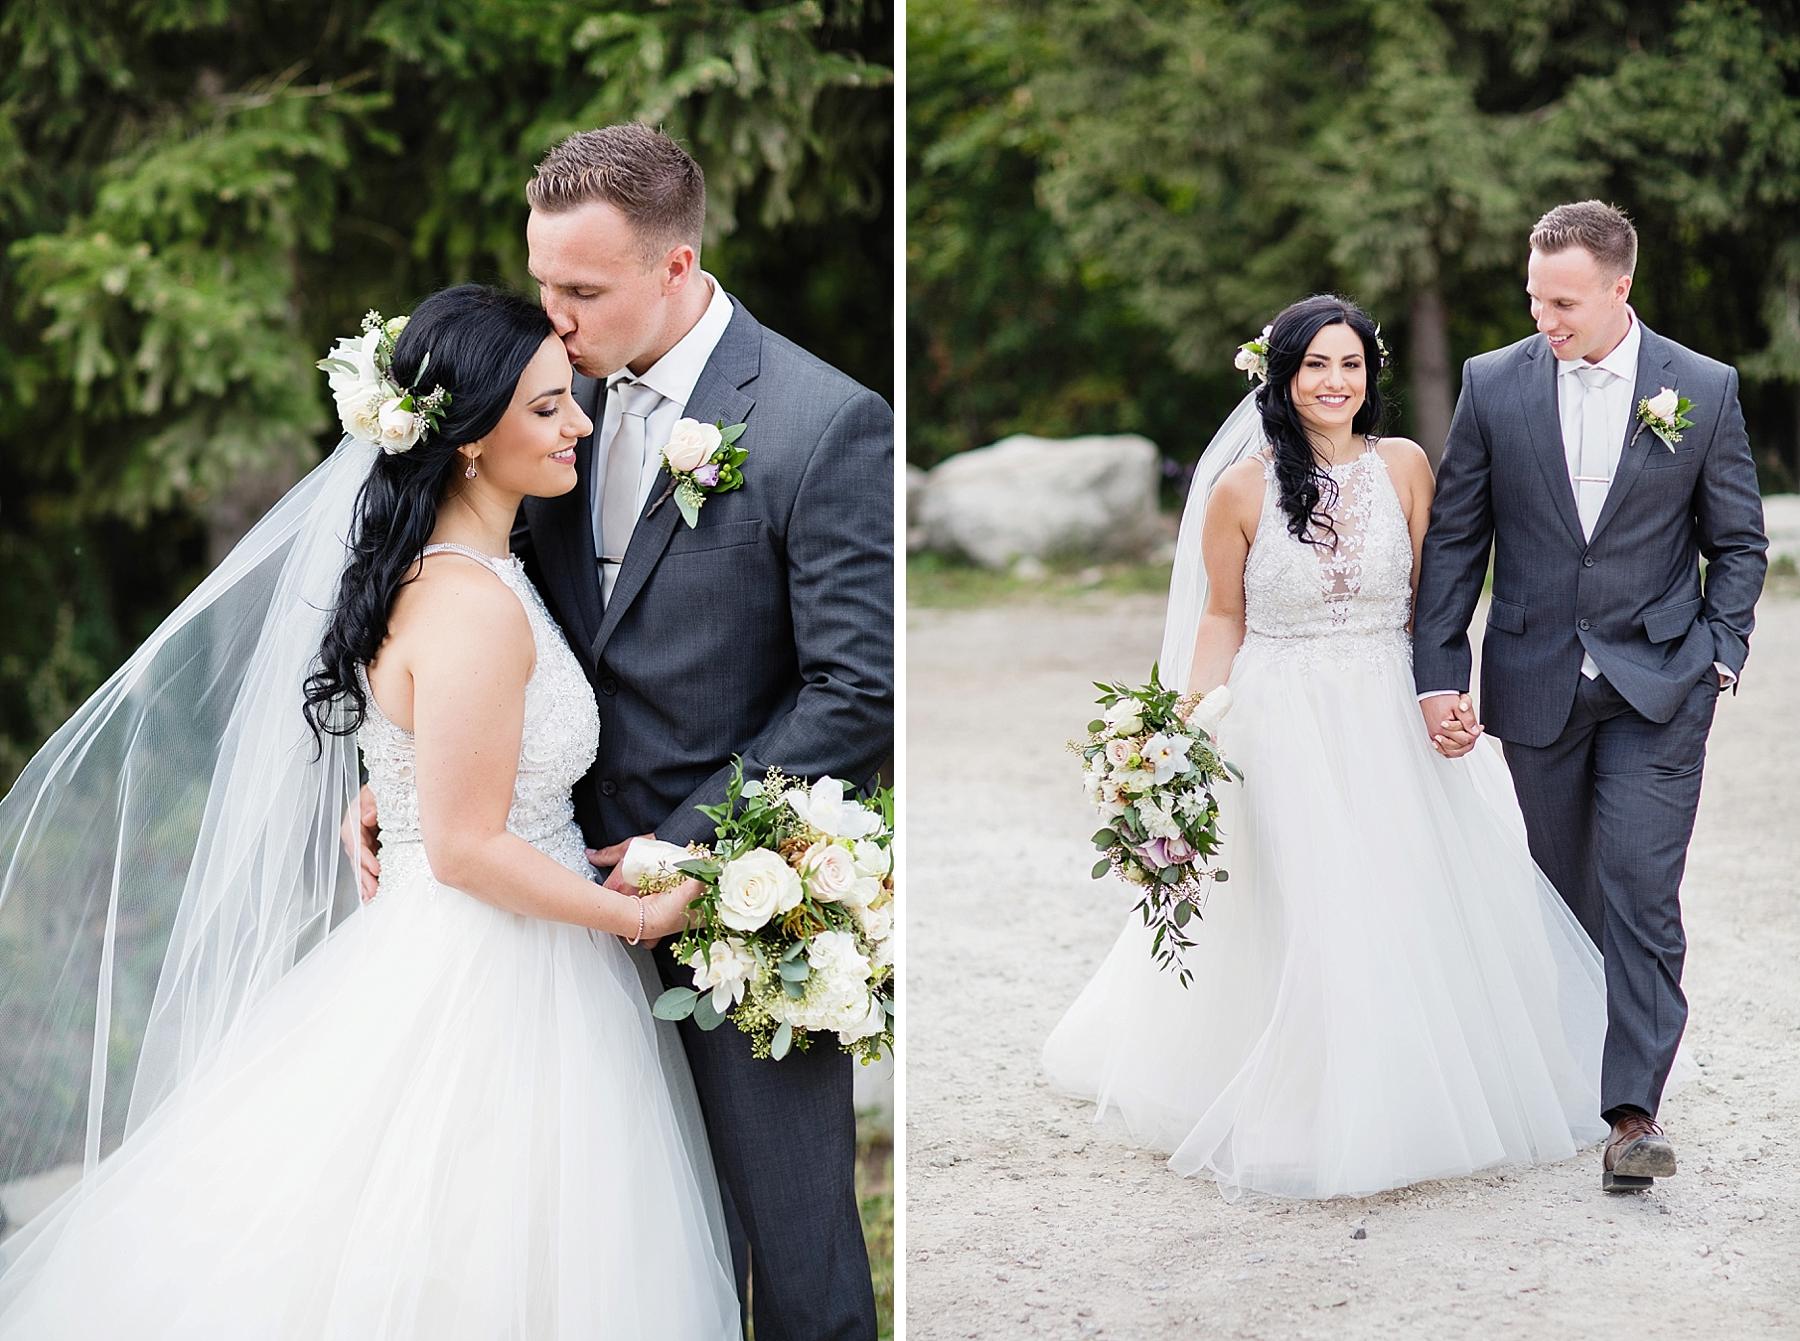 windsor-wedding-photographer-sprucewood-shores-winery-wedding-niagara-on-the-lake-wedding-photographer-eryn-shea-photography_0035.jpg